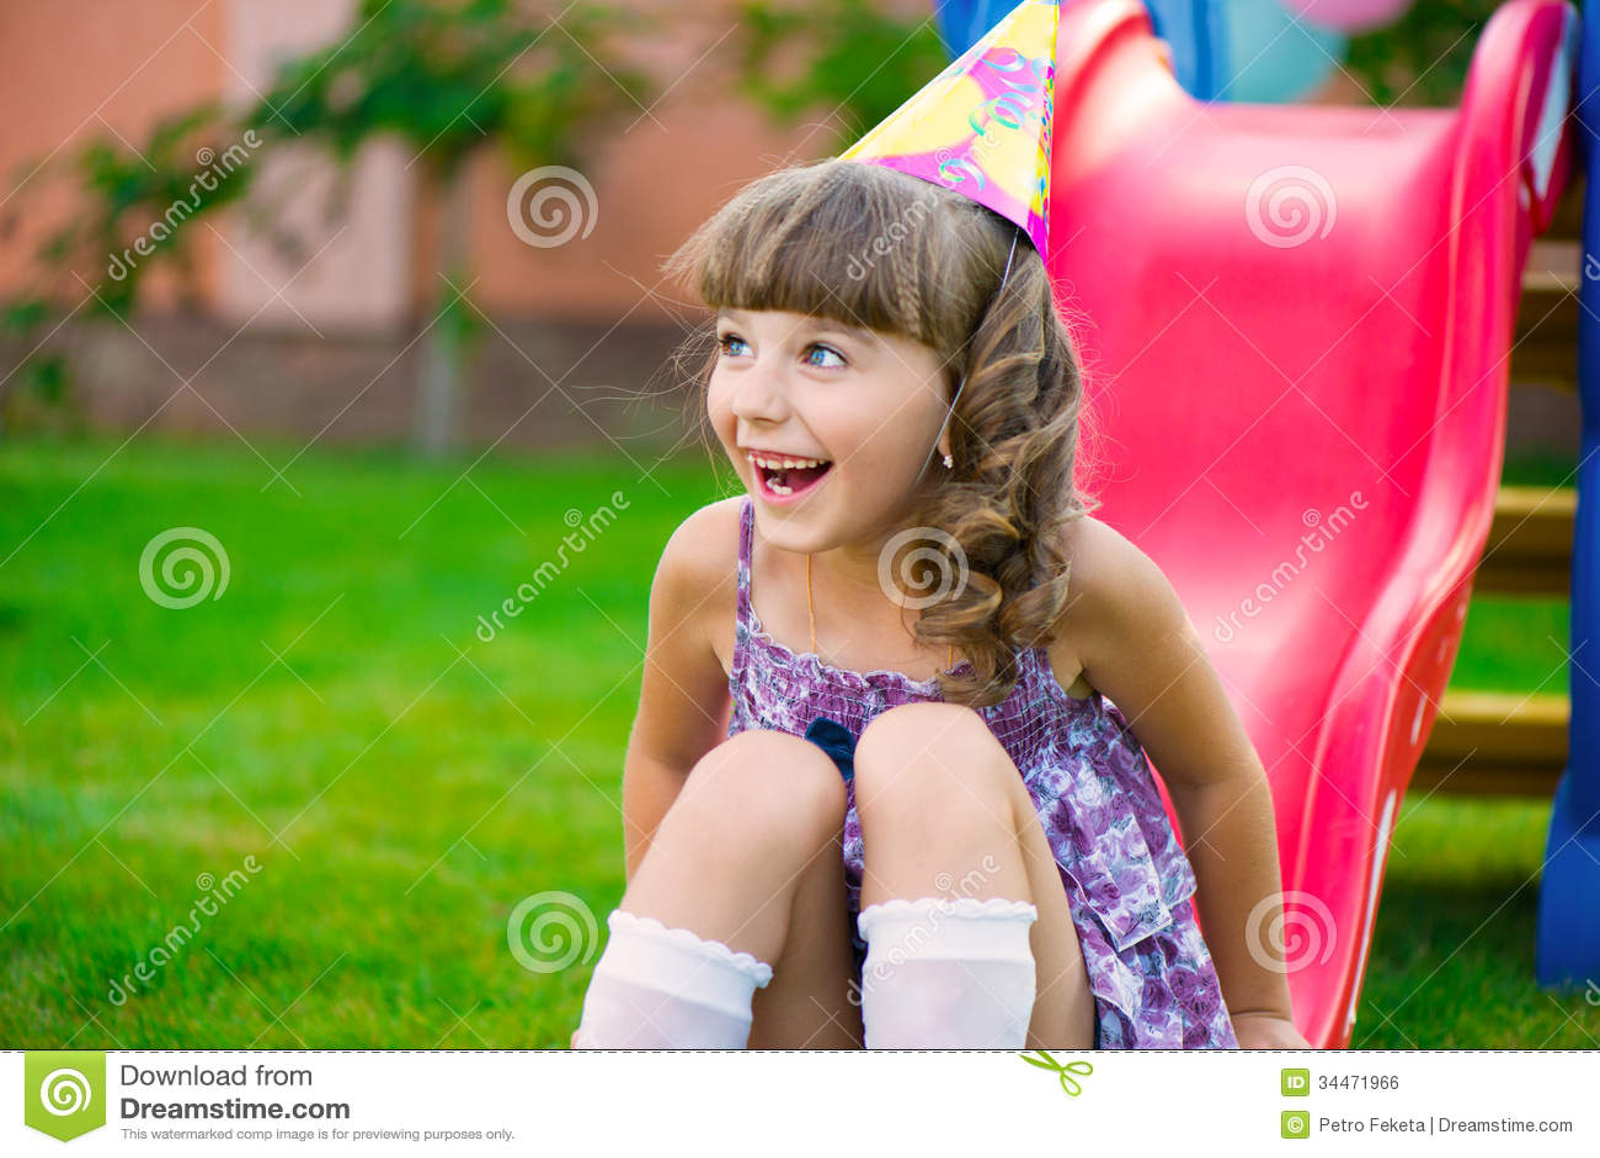 Pretty Little Girl Having Fun On Playground Royalty Free Stock Image ...